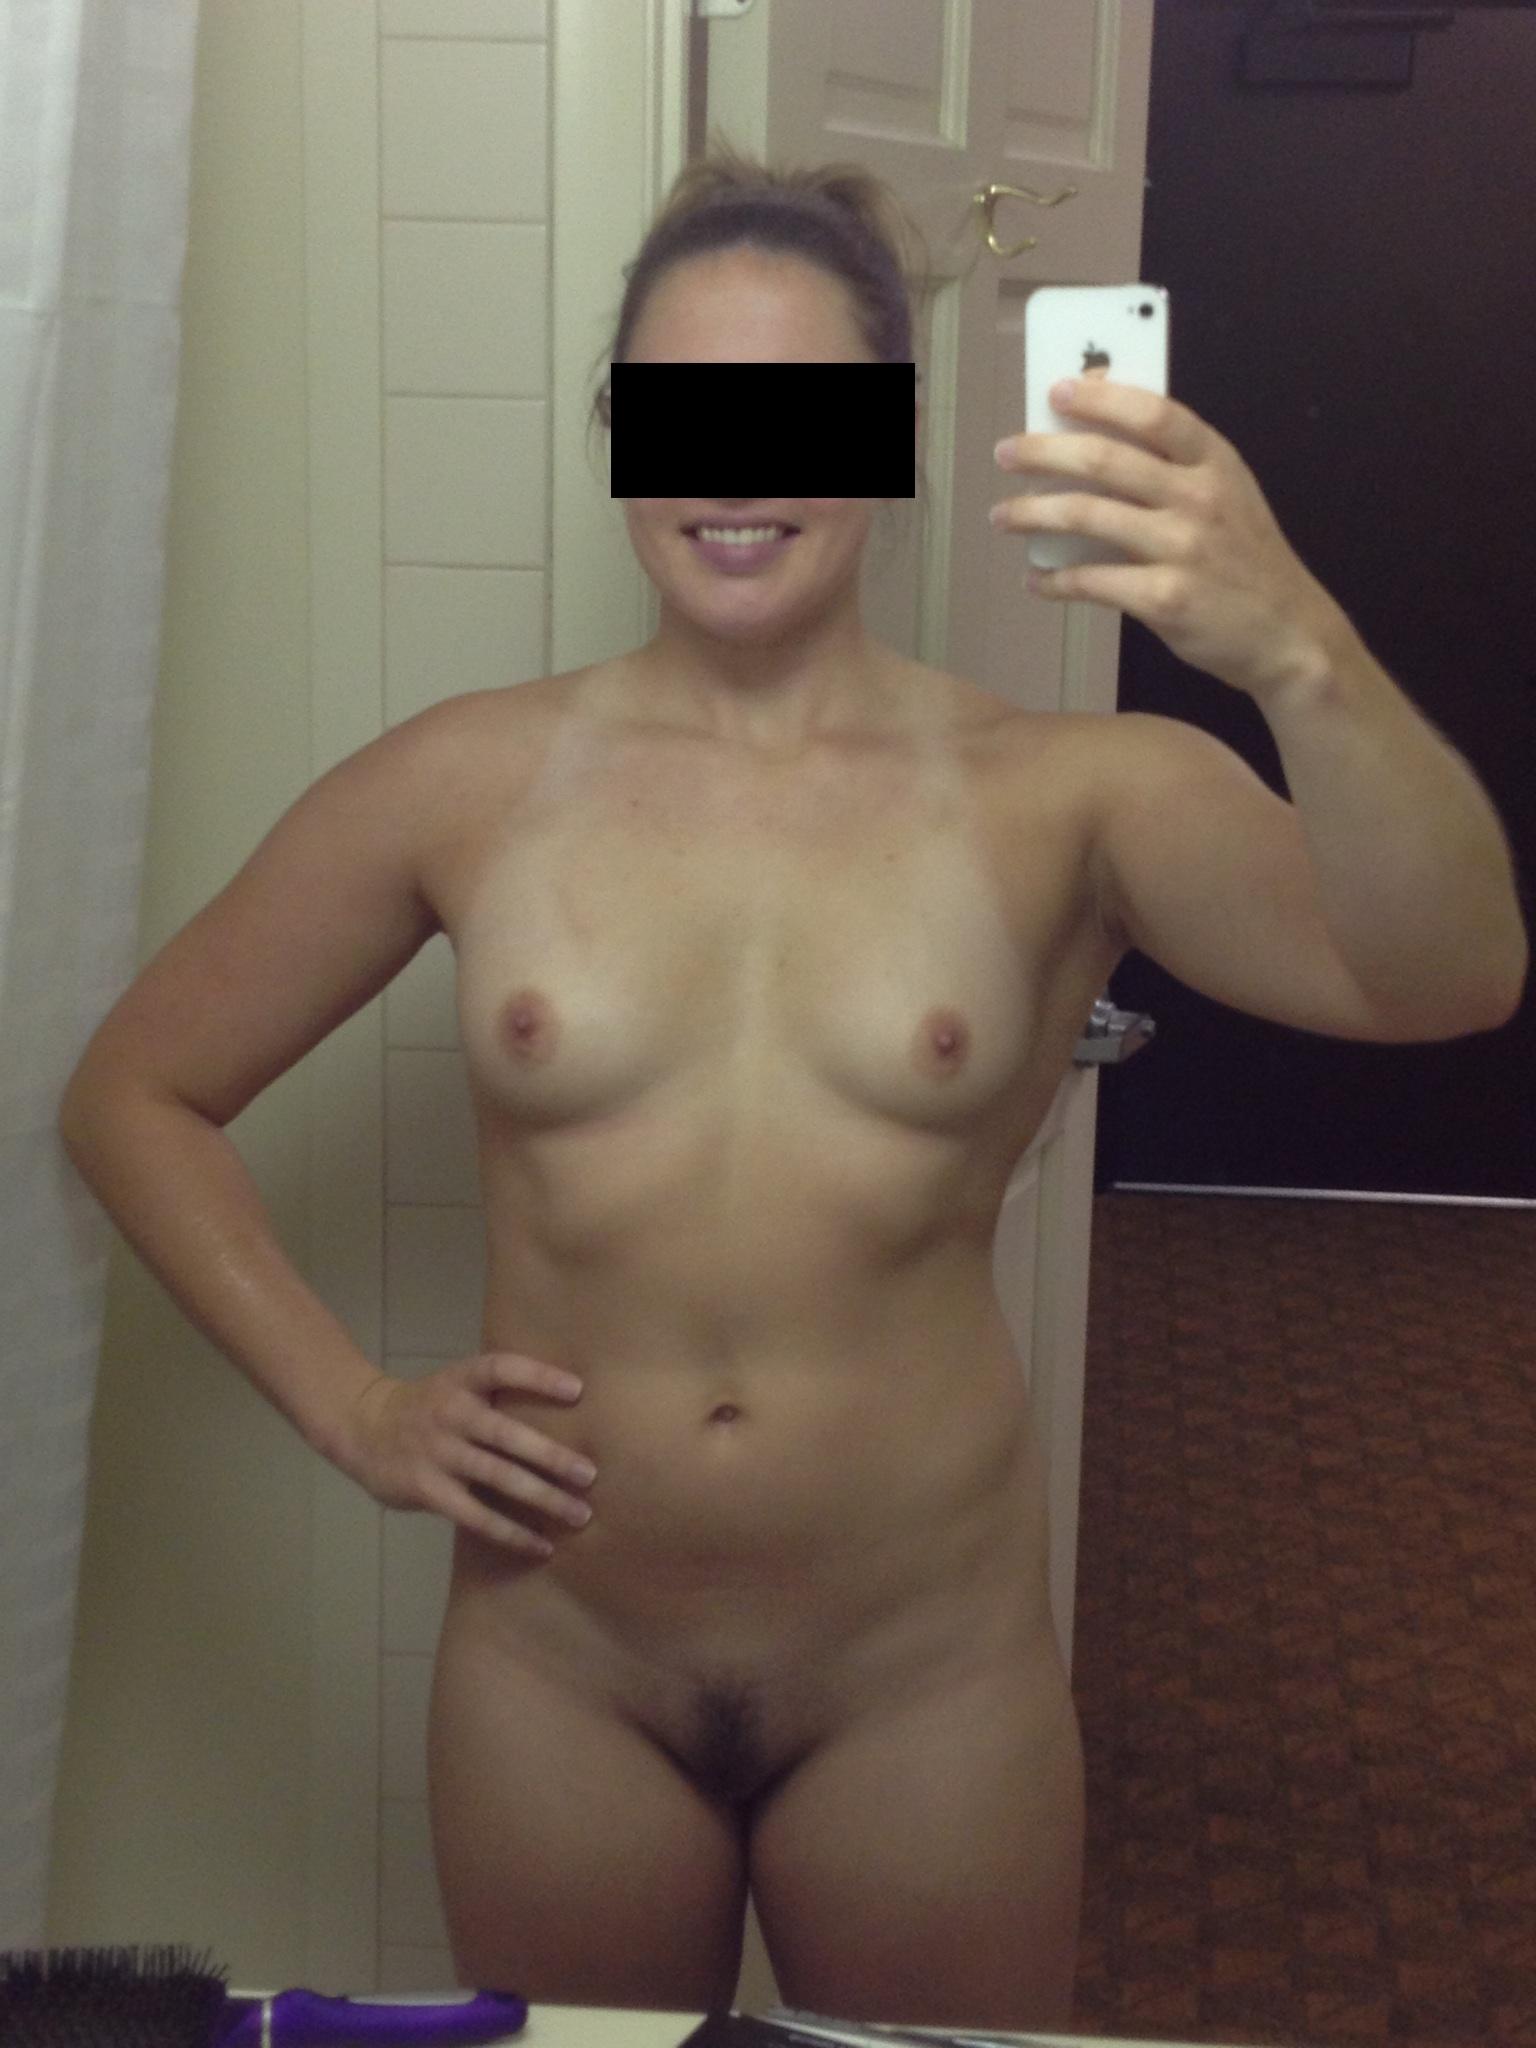 Ronda rousey nude leak